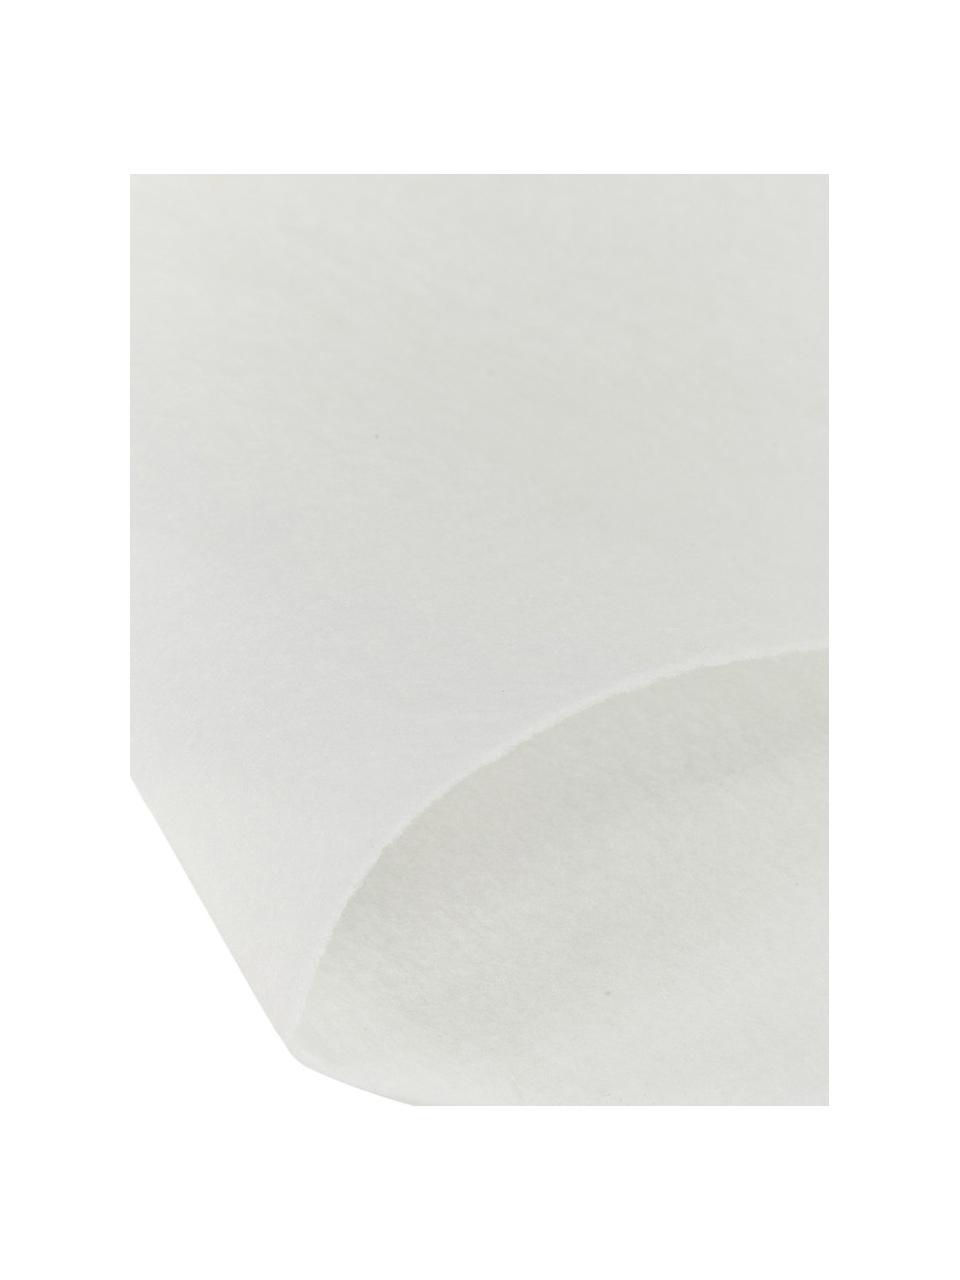 Onderlaag van vlies voor vloerkleed My Slip Stop van polyester vlies, Polyestervlies met anti-sliplaag, Crèmekleurig, 180 x 270 cm